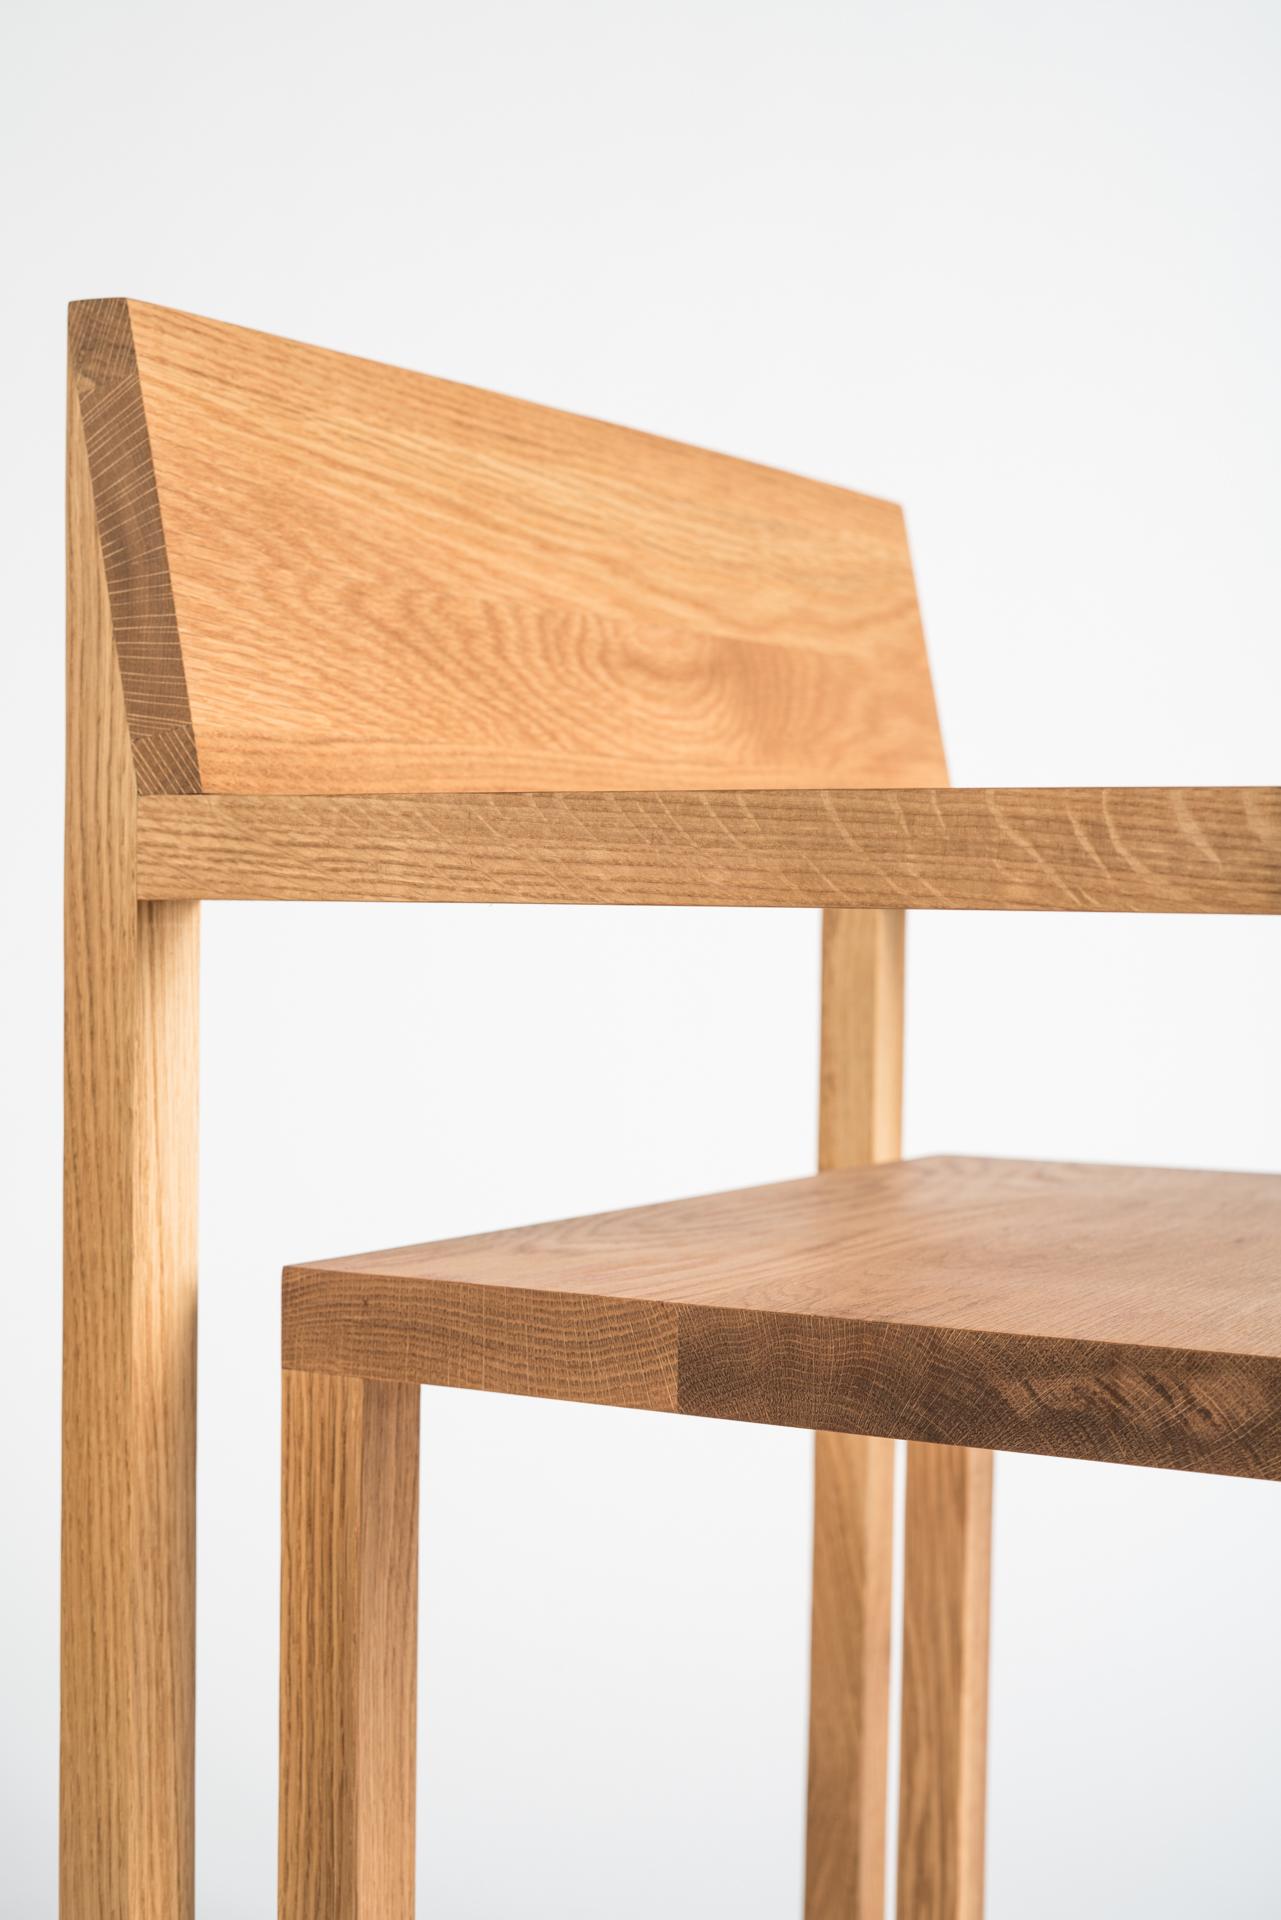 Furniture-web-45.jpg